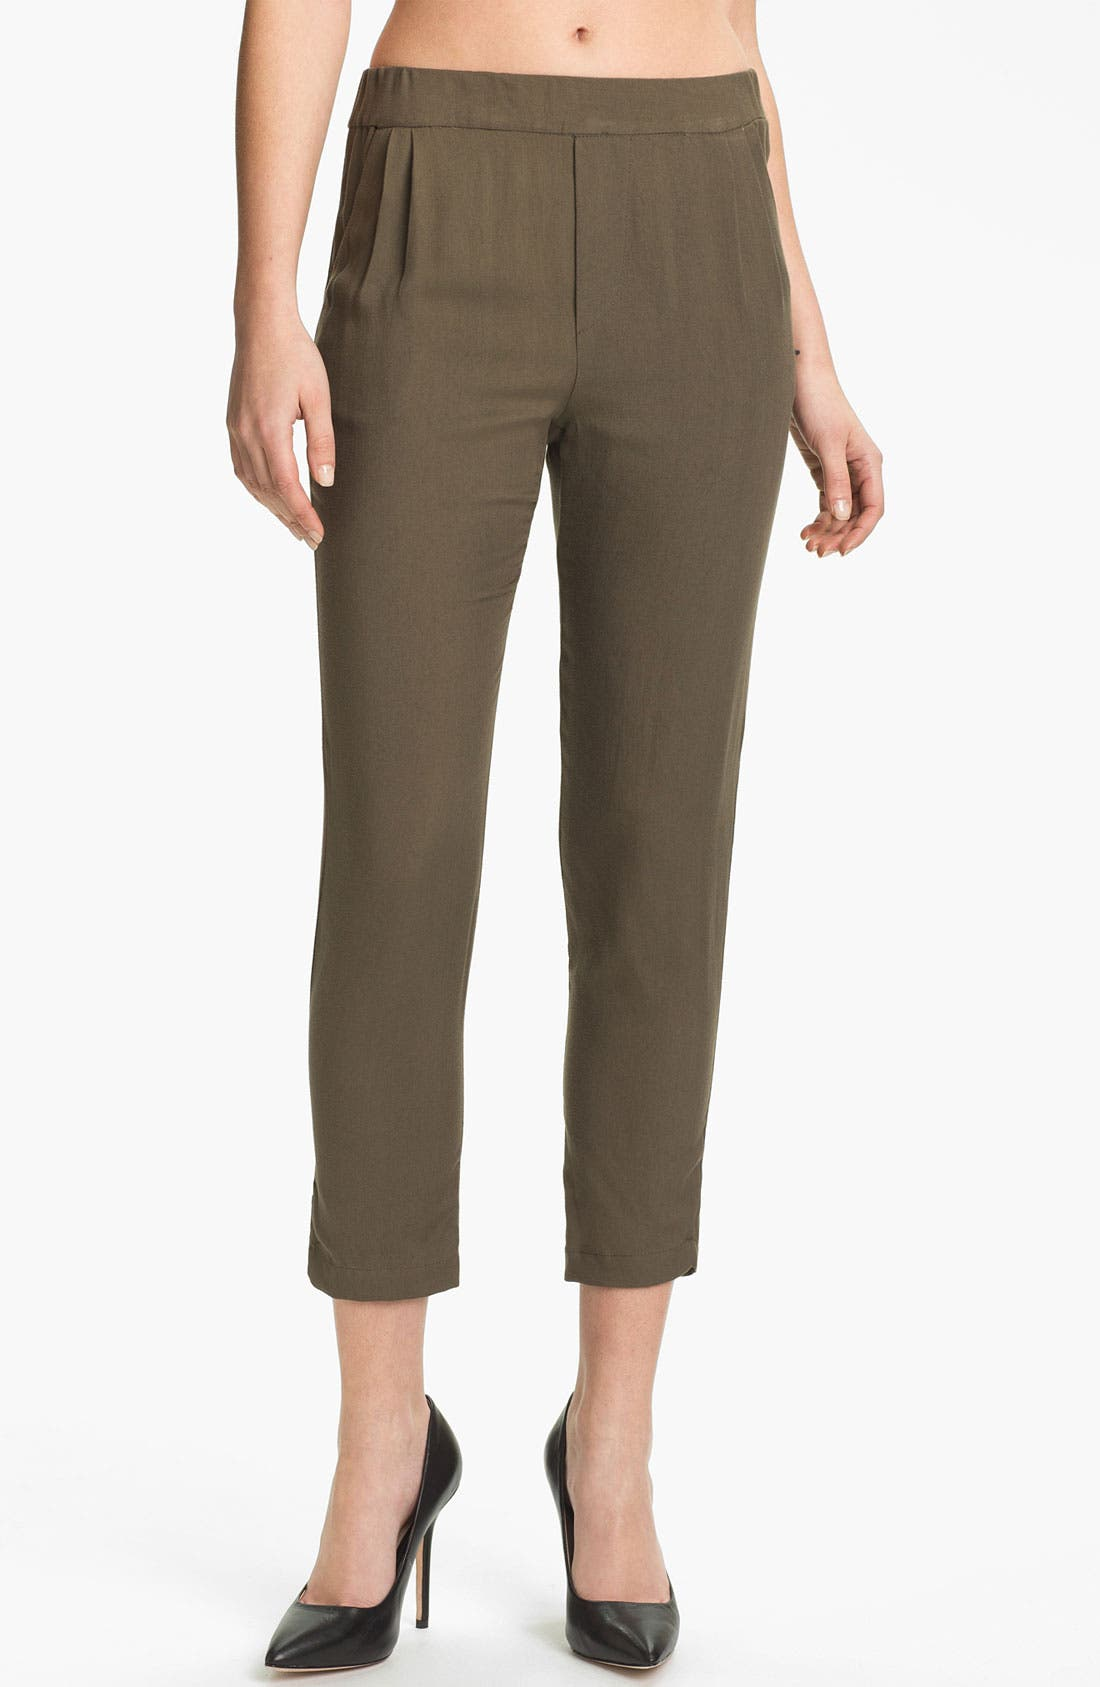 Alternate Image 1 Selected - Ella Moss 'Aiselin' Tapered Crop Pants